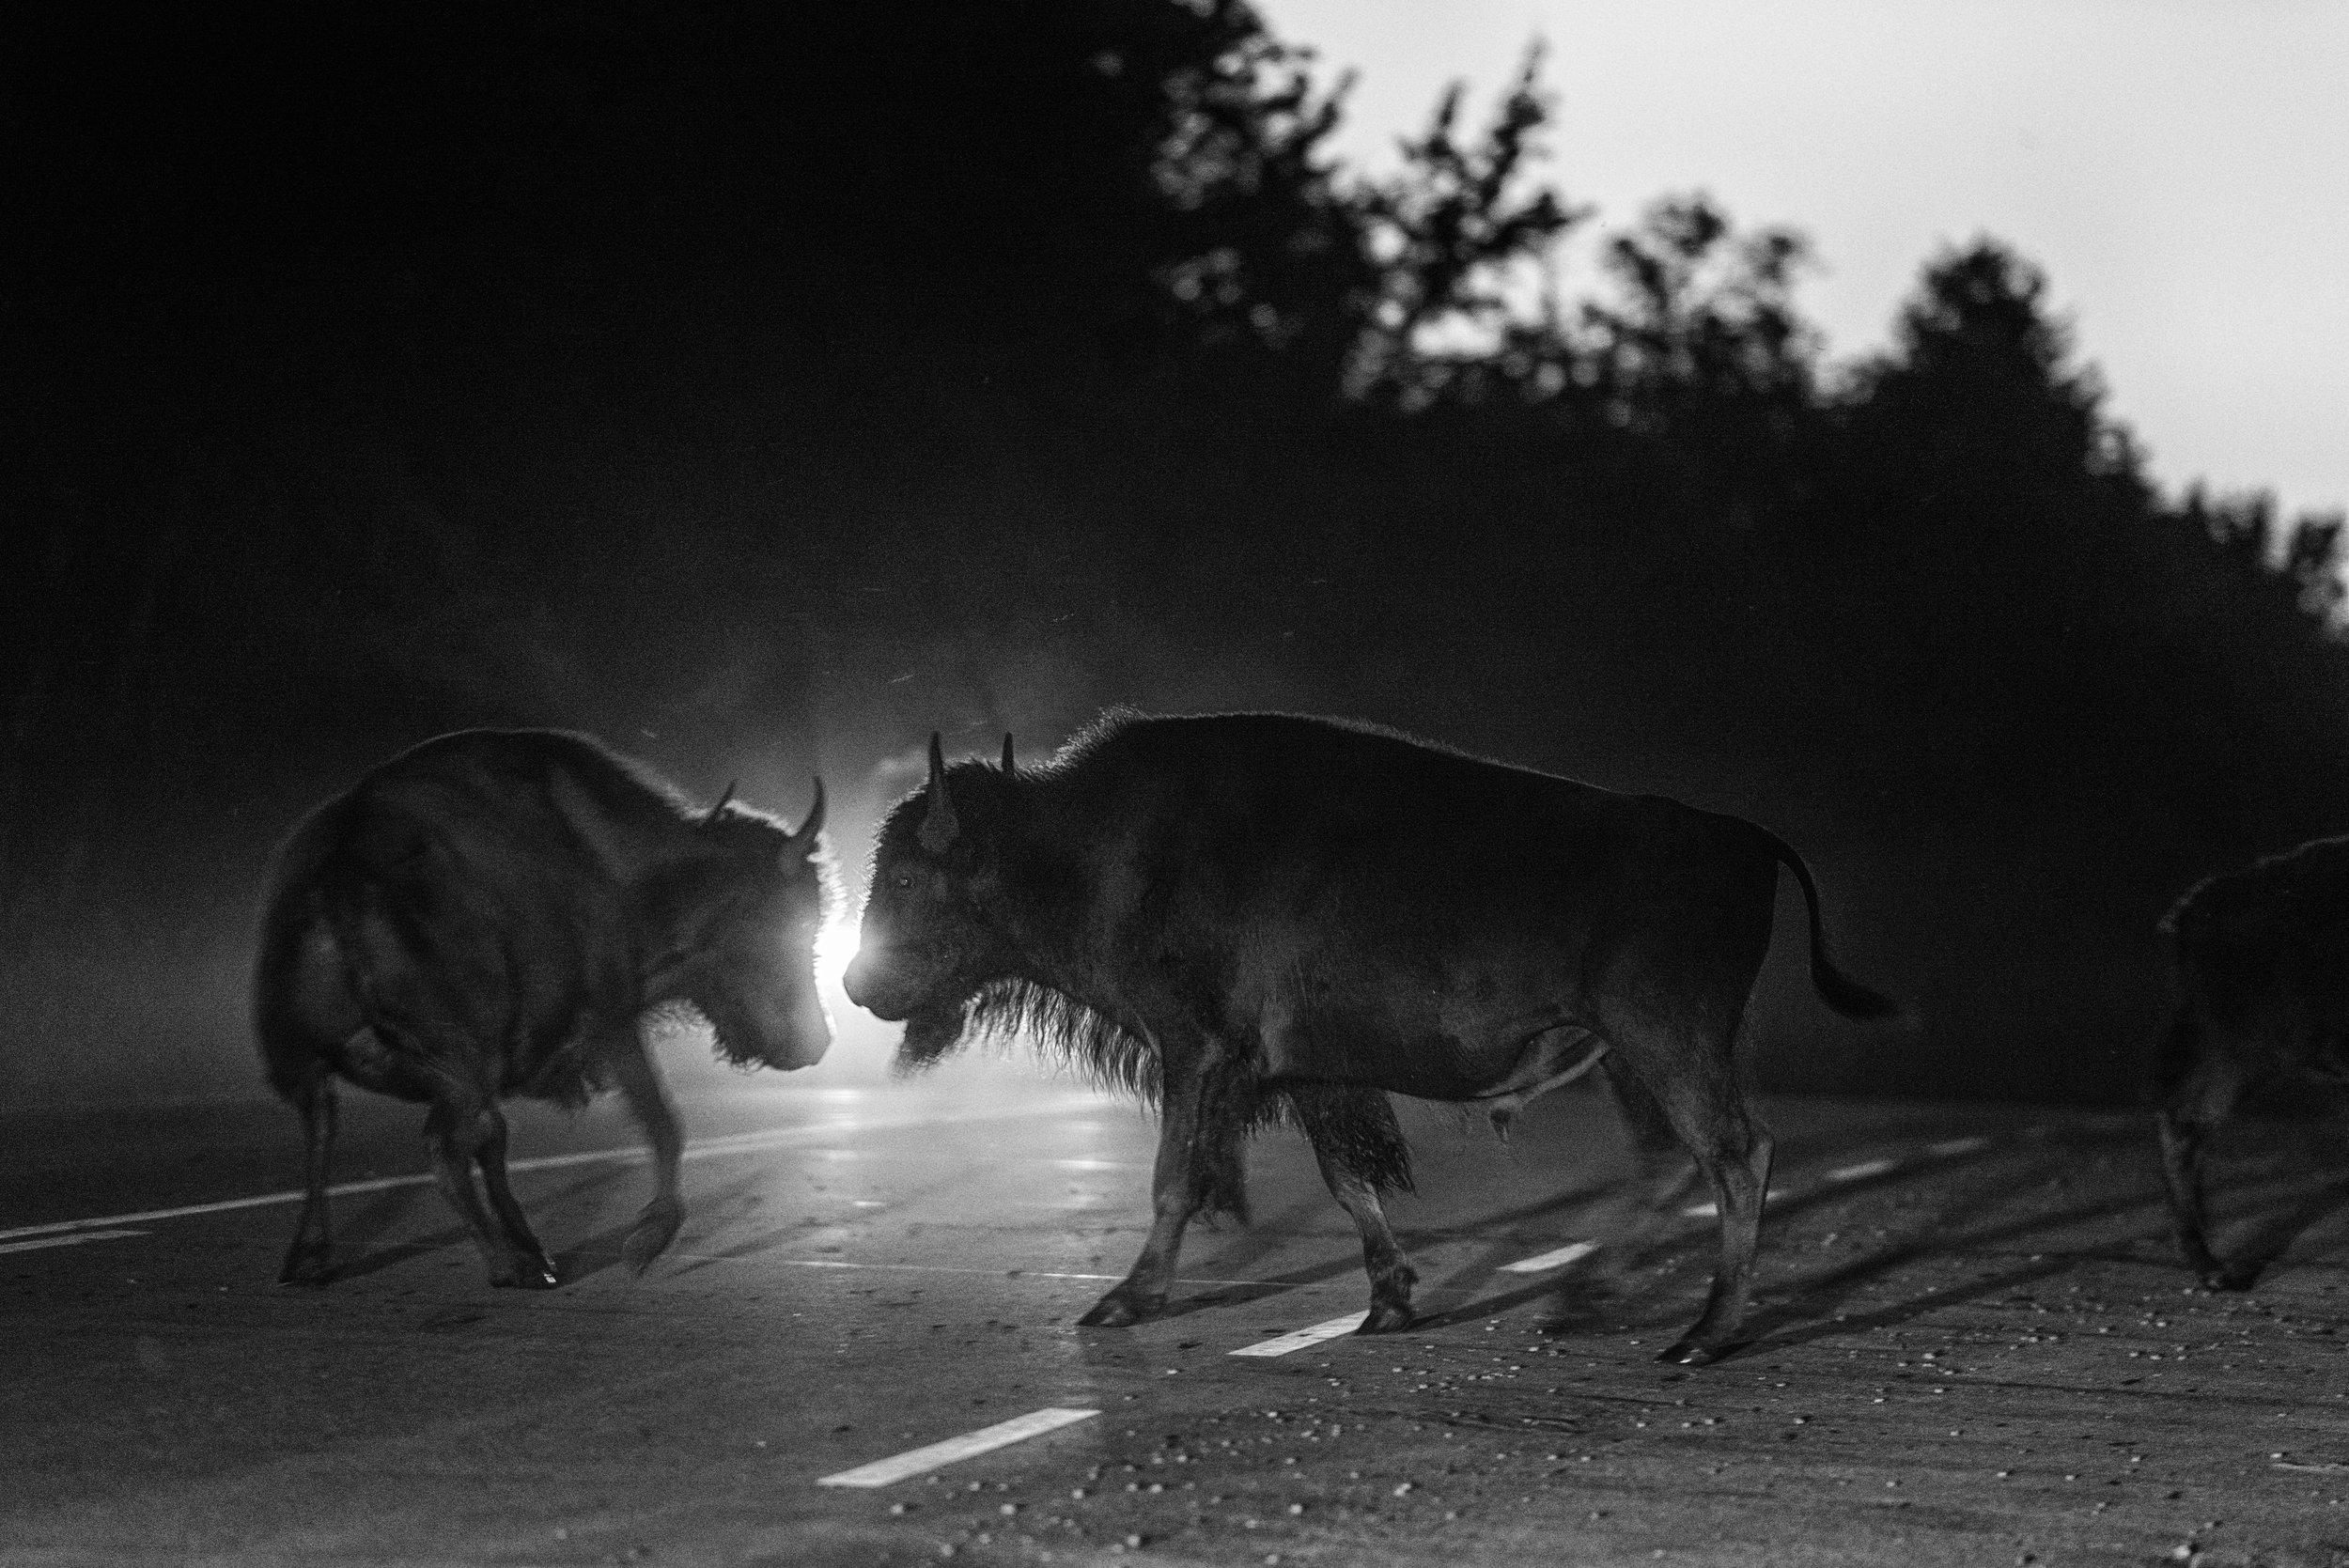 Bison in Headlights, Elk Island National Park, Canada